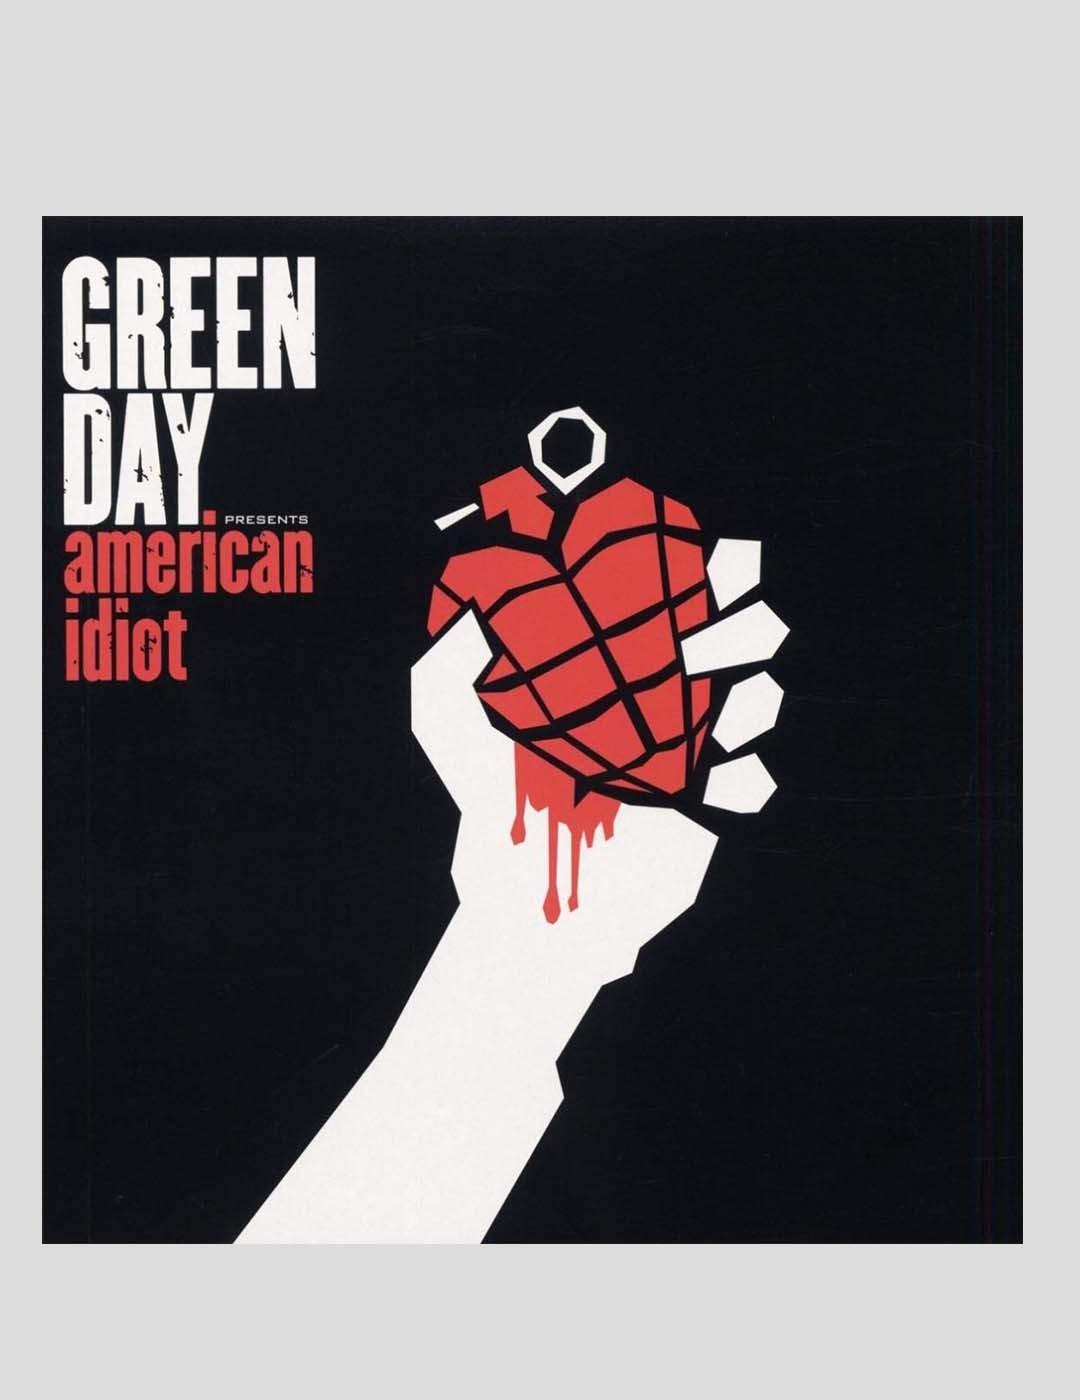 VINILO GREEN DAY - AMERICAN IDIOT 2LPS VINYL